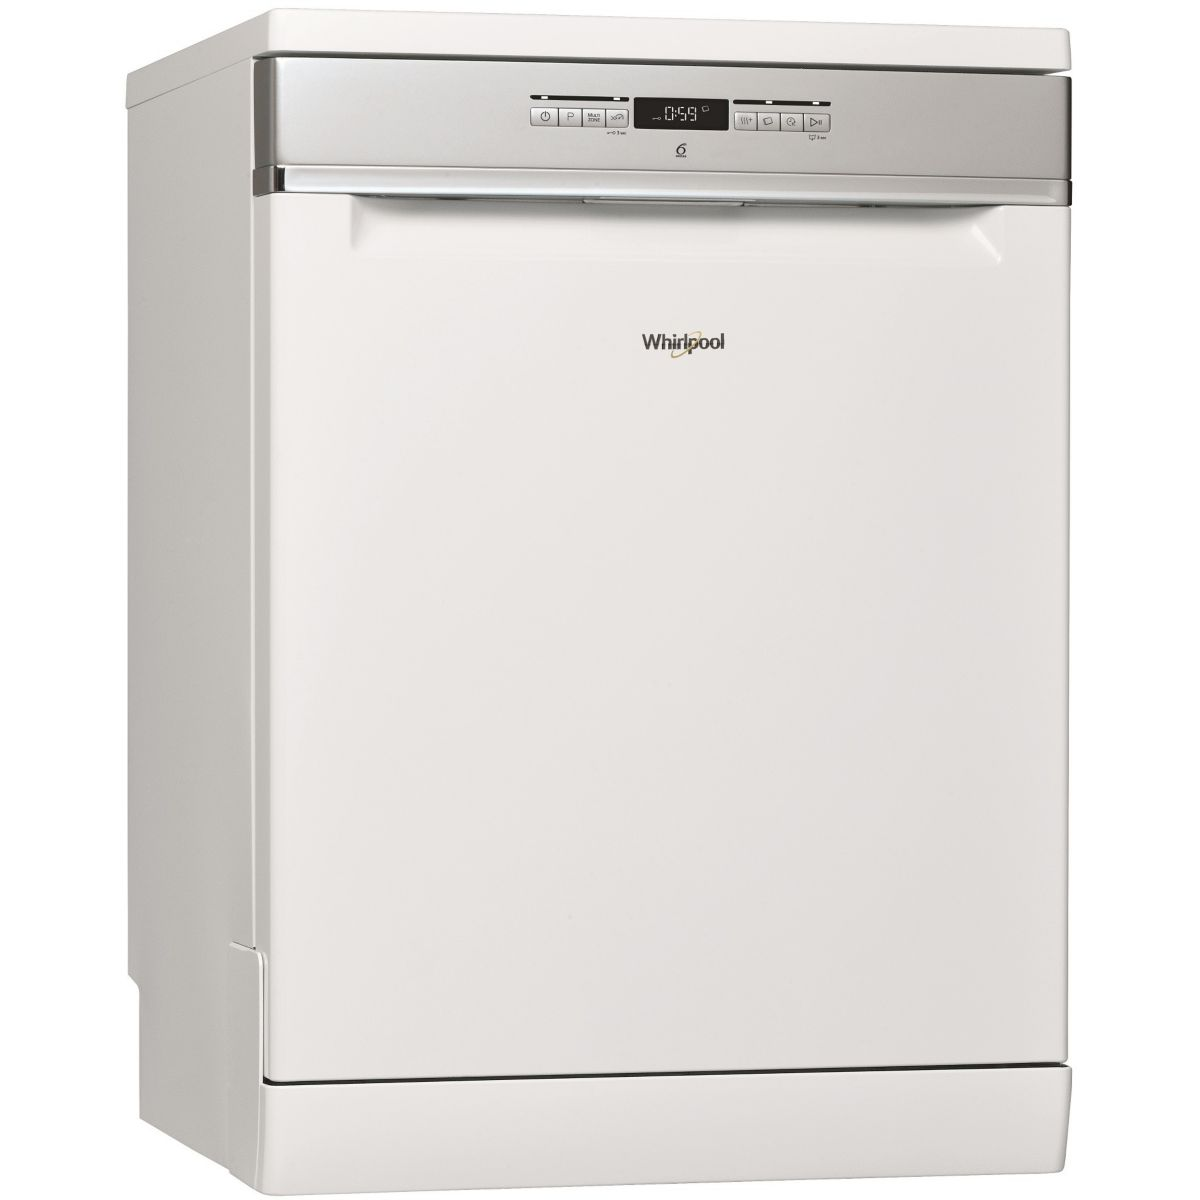 Lave vaisselle 60 cm WHIRLPOOL WFO3T222